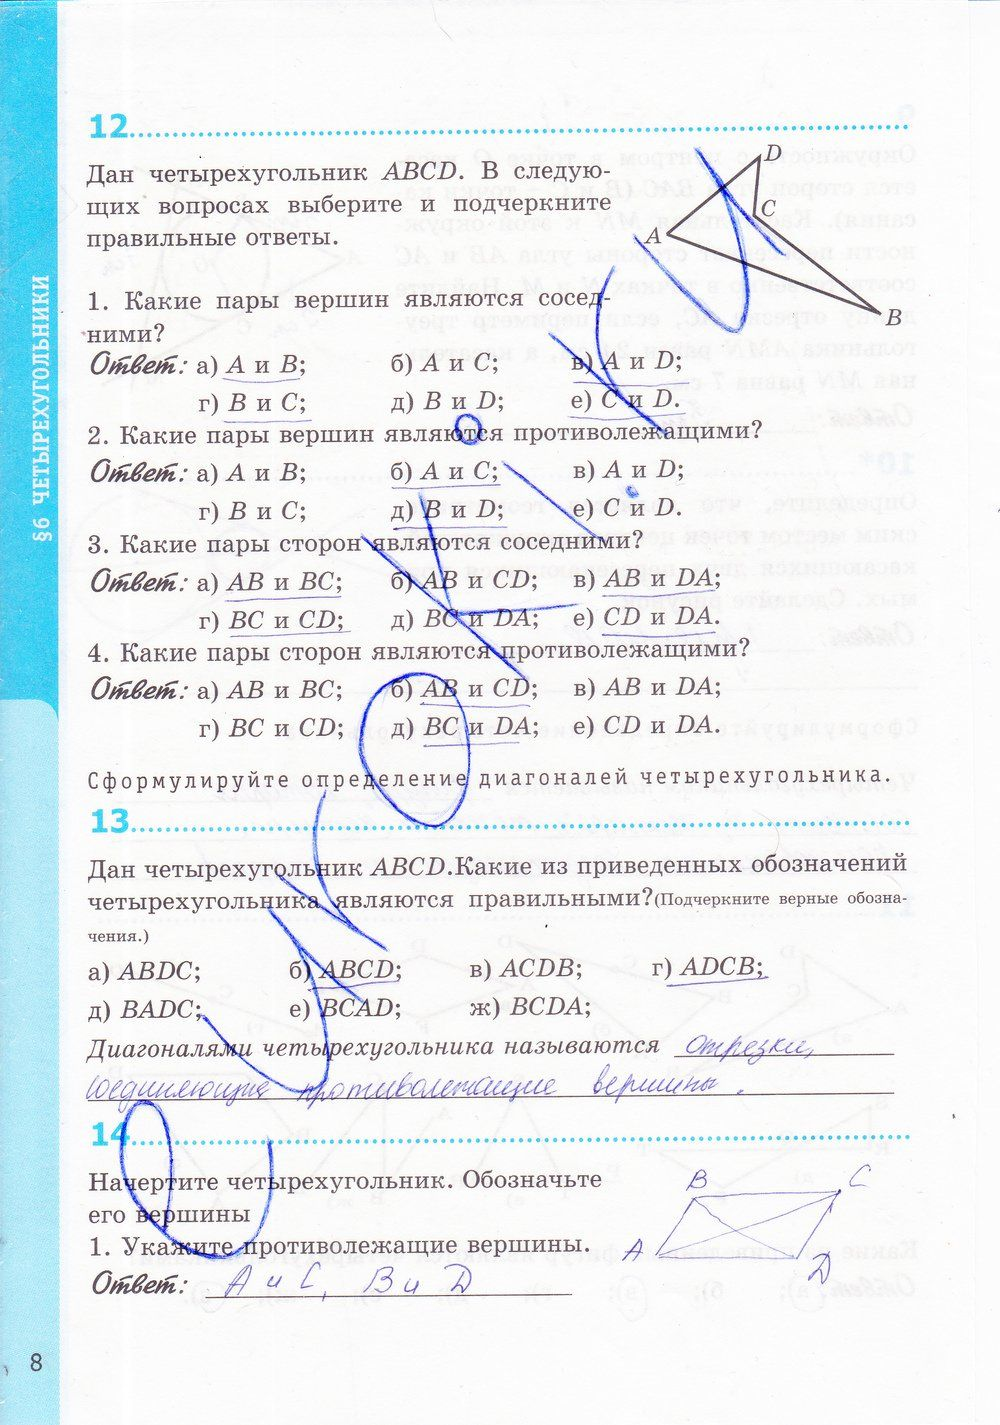 гдз тетрадка алгебра 8 класс лебединцева и беленкова ответы